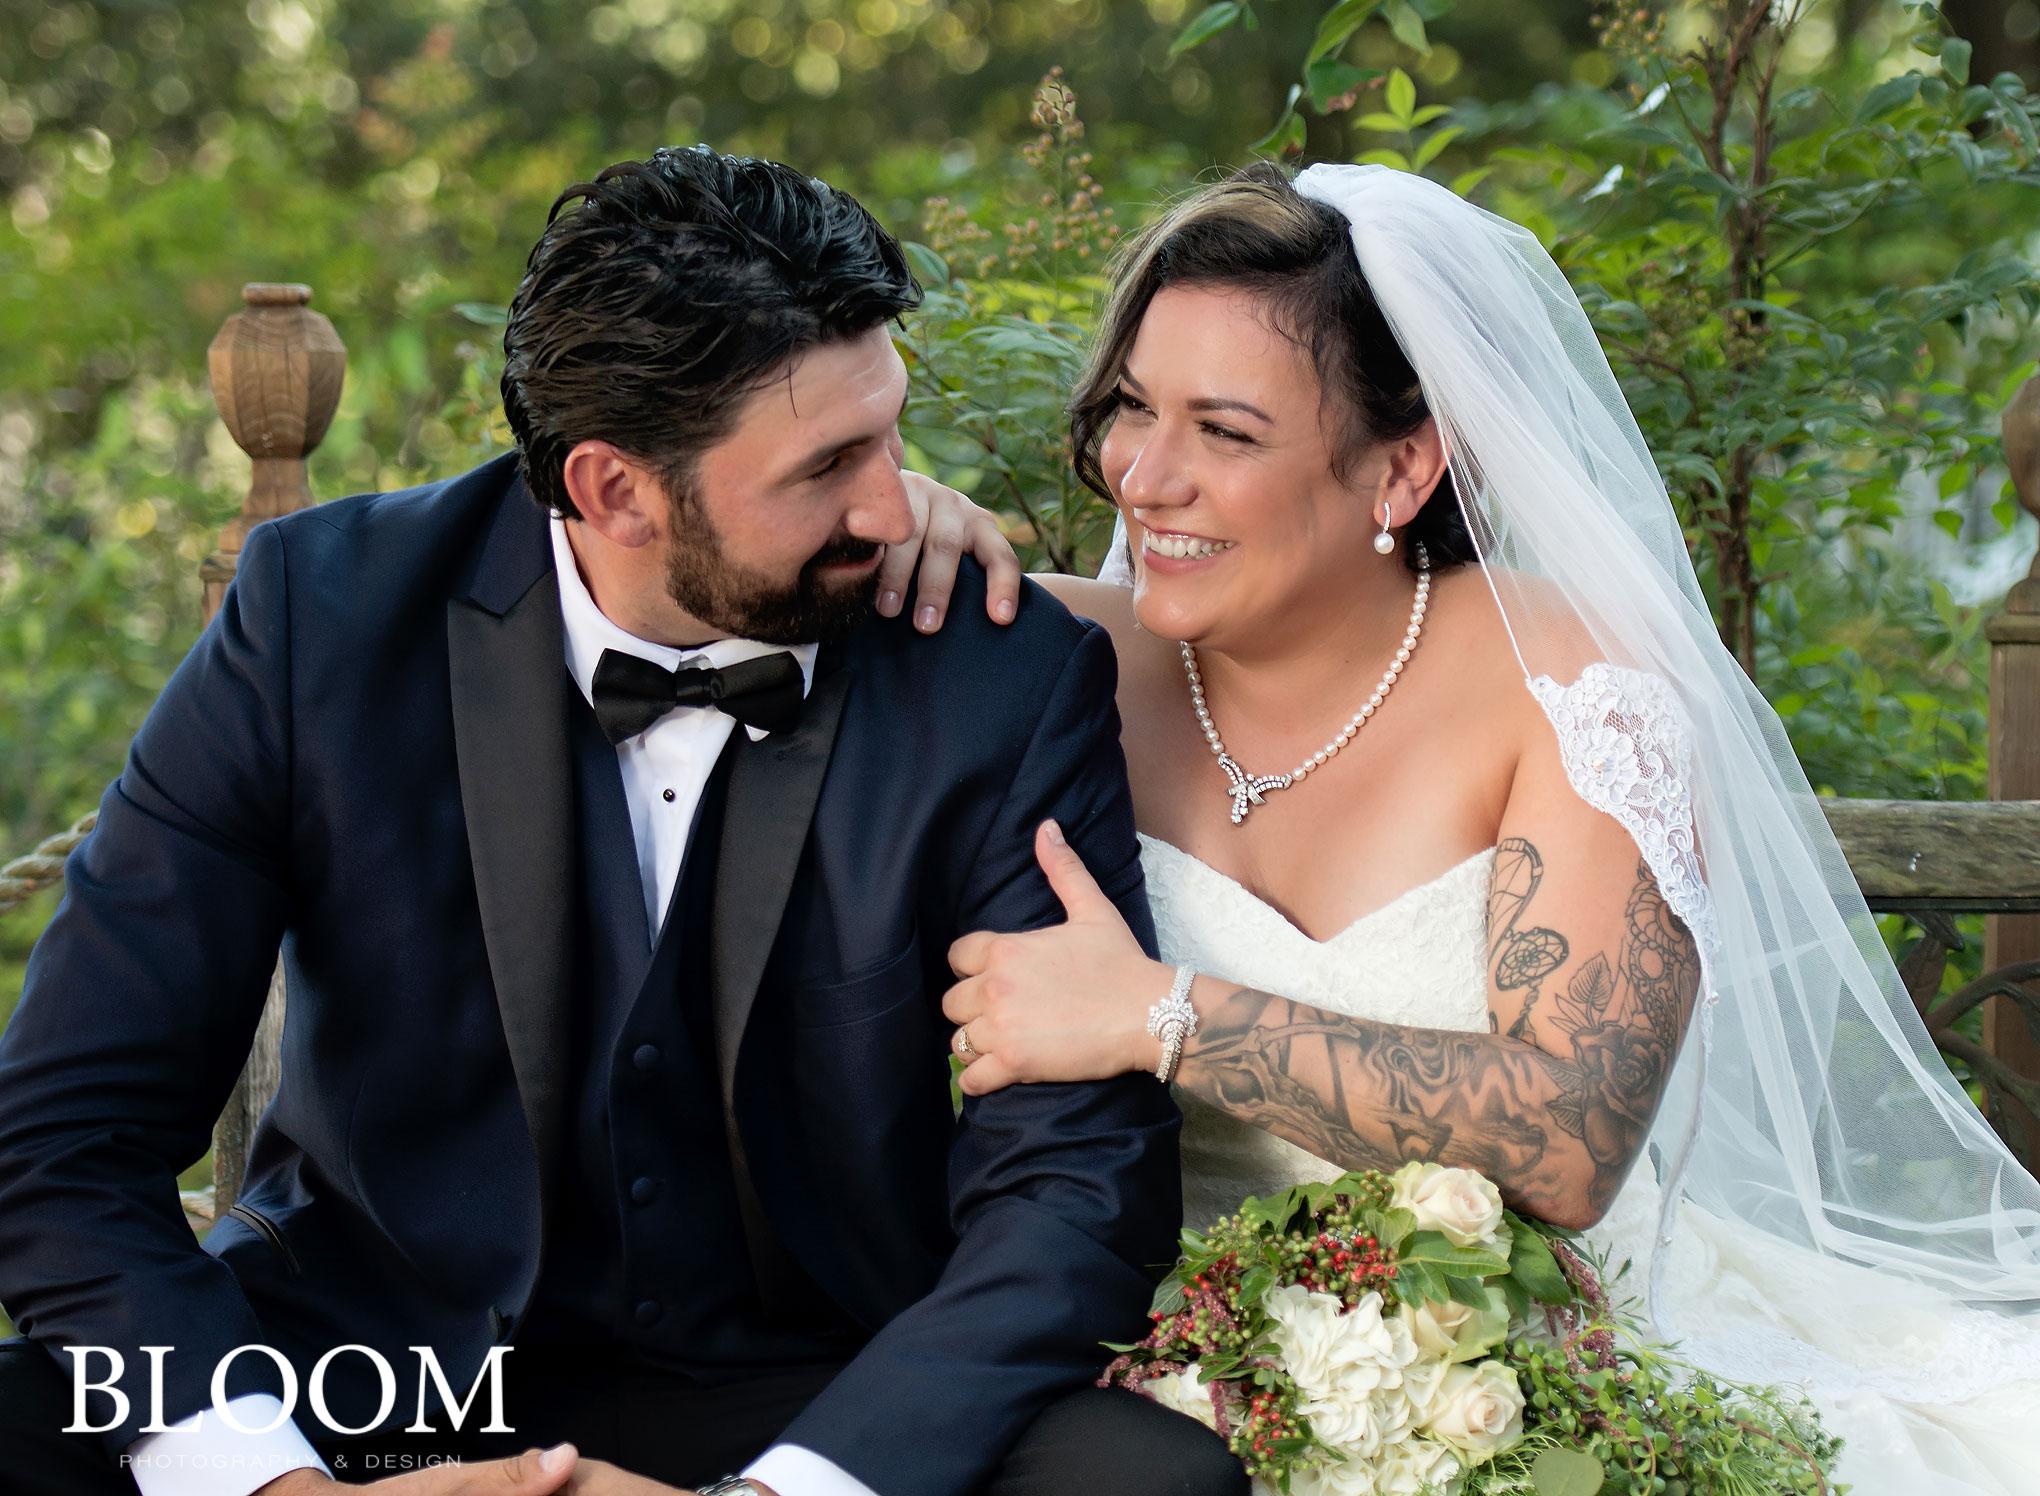 Wedding_photography_san_antonio_texas_bloom_NMM_6056.jpg